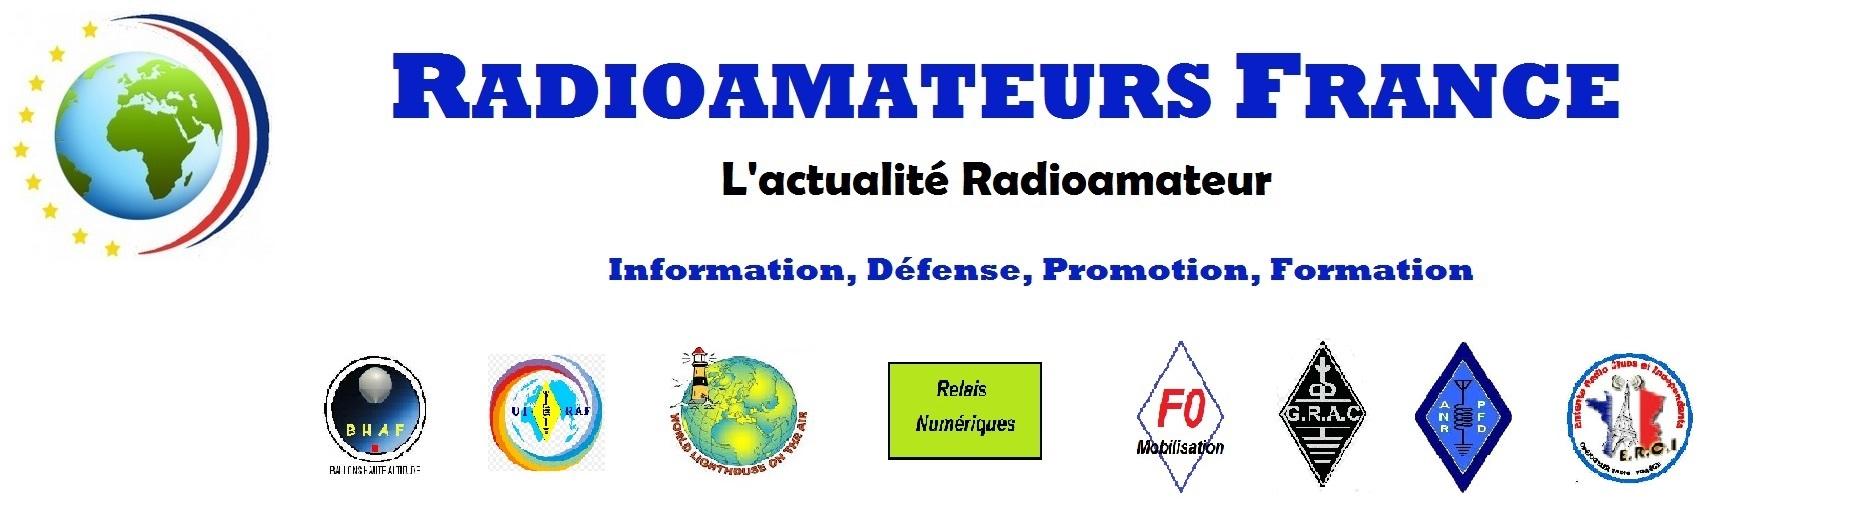 Radioamateurs France